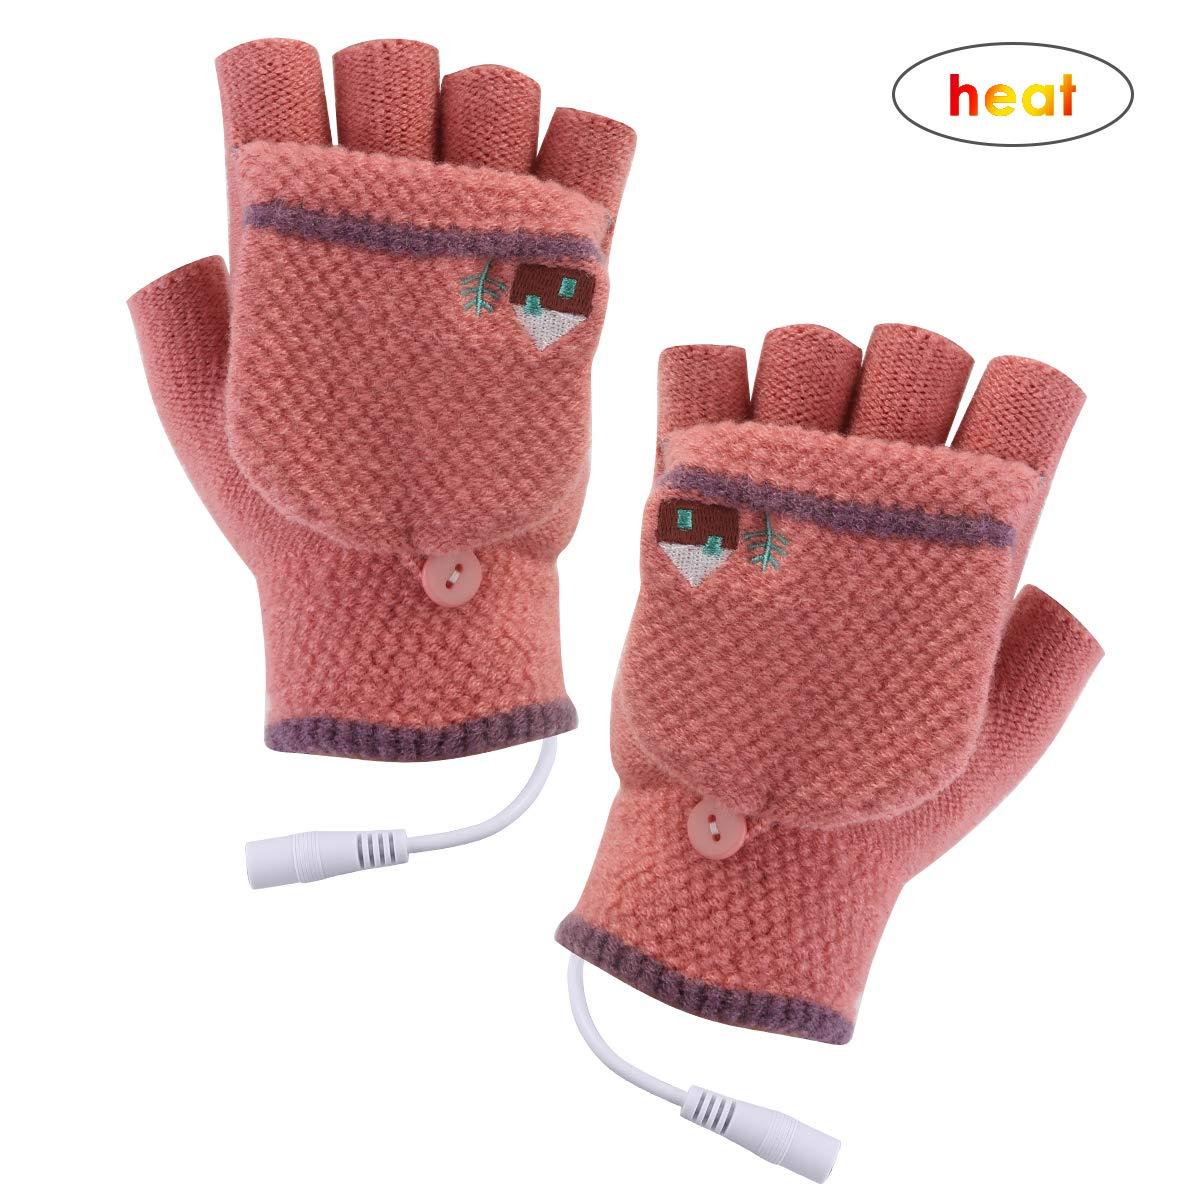 Yinuoday Unisex Women's & Men's USB Heated Gloves Mitten Winter Hands Warm Laptop Gloves Full & Half Heated Fingerless Heating Knitting Hands Warmer Washable Design